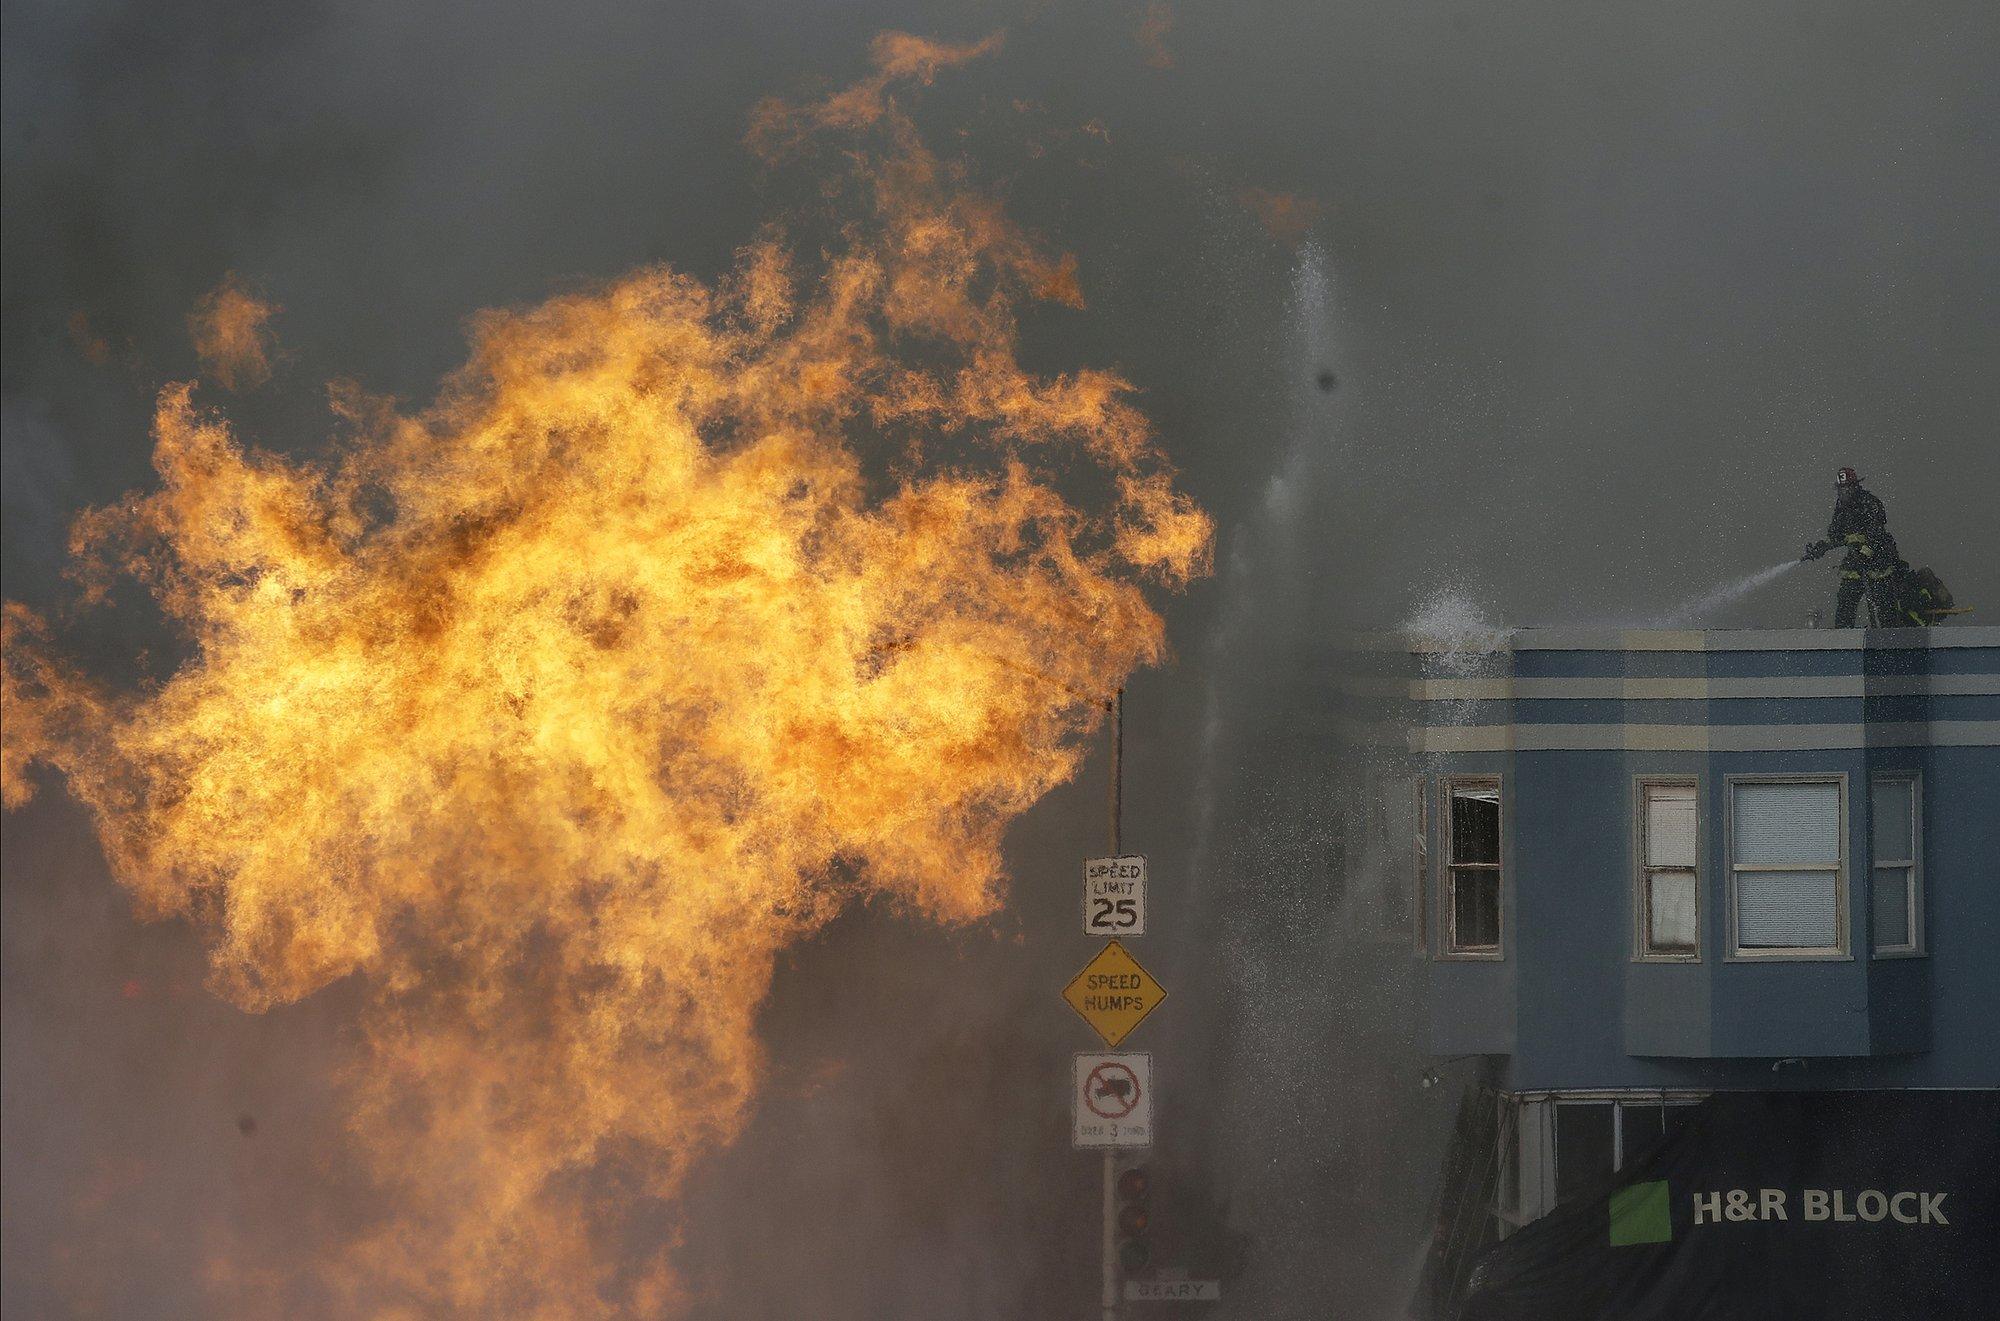 Gas line explosion in San Francisco ignites buildings